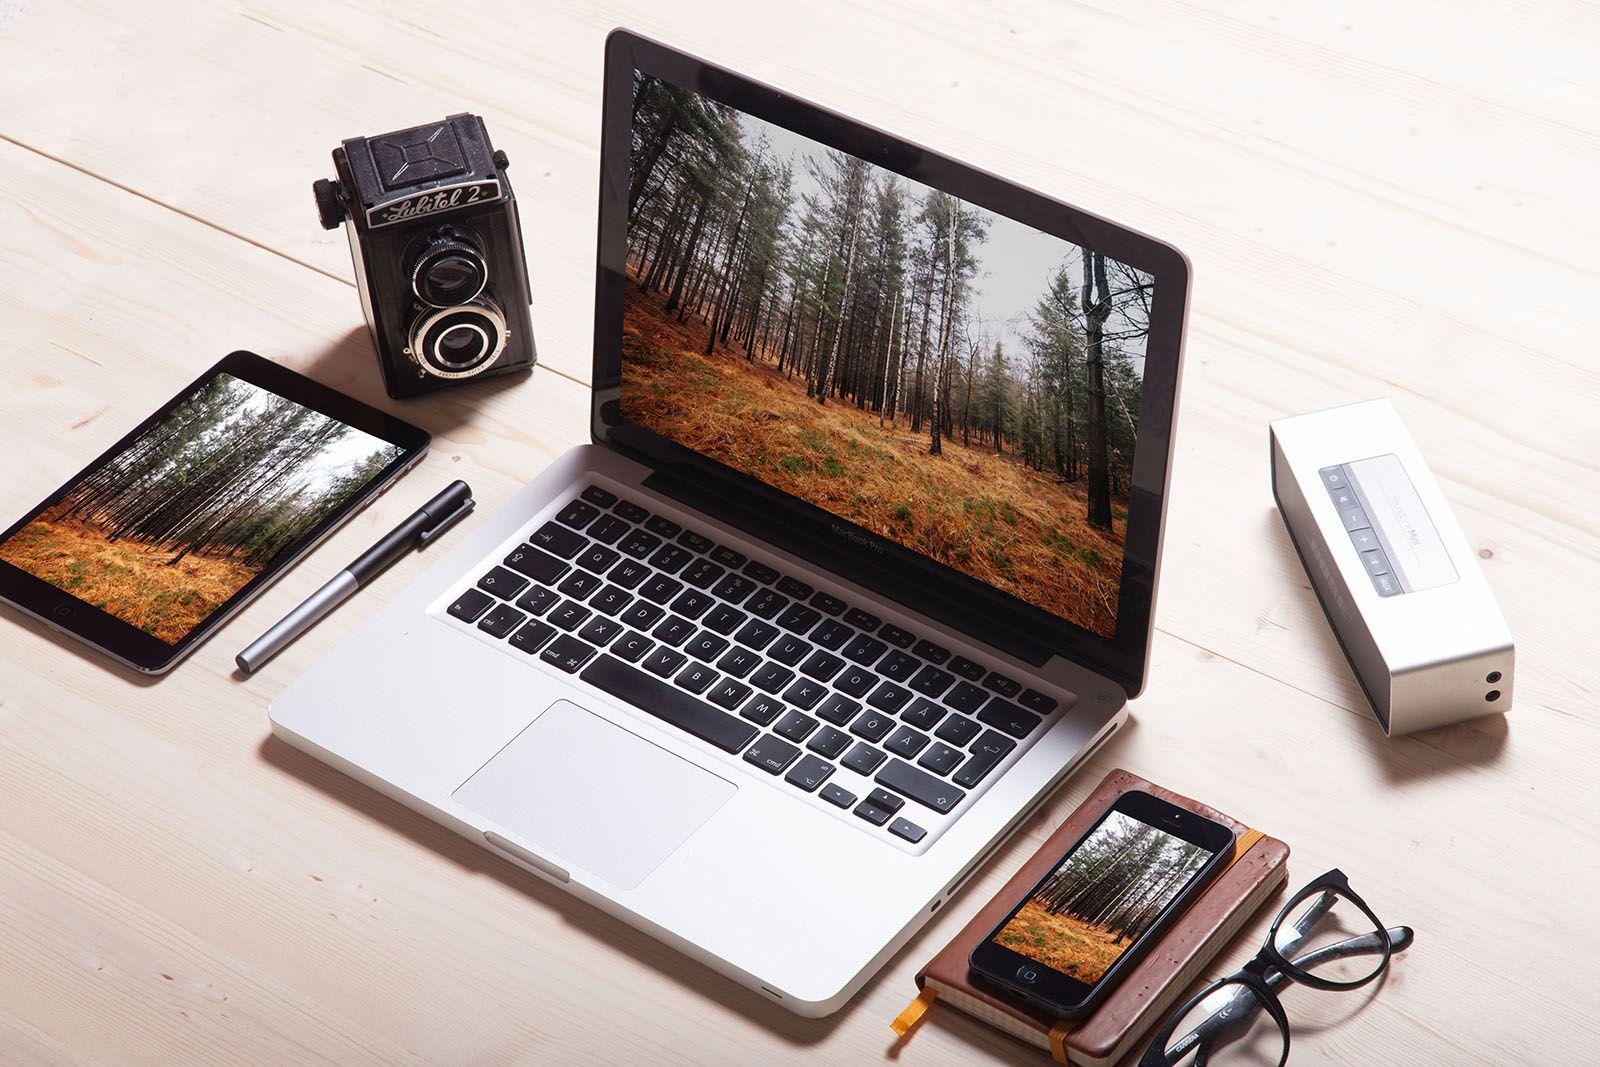 Macbook Ipad Iphone Vintage Camera Vintage Camera Iphone Macbook Free Stock Photos Image